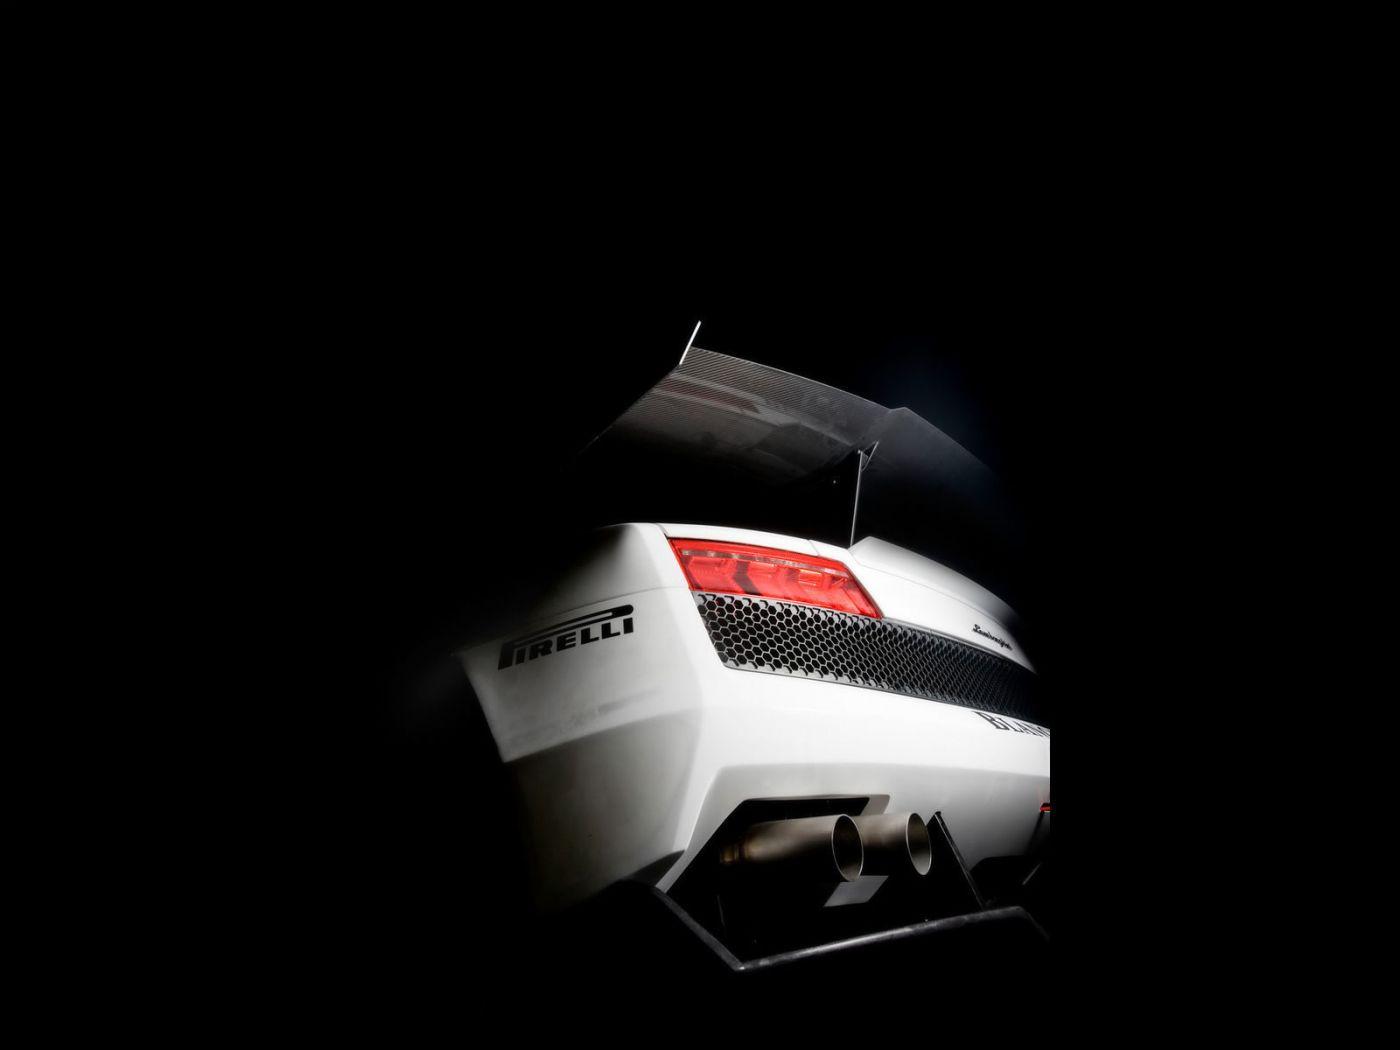 Super Trofeo White Rear View Wallpaper 1400x1050